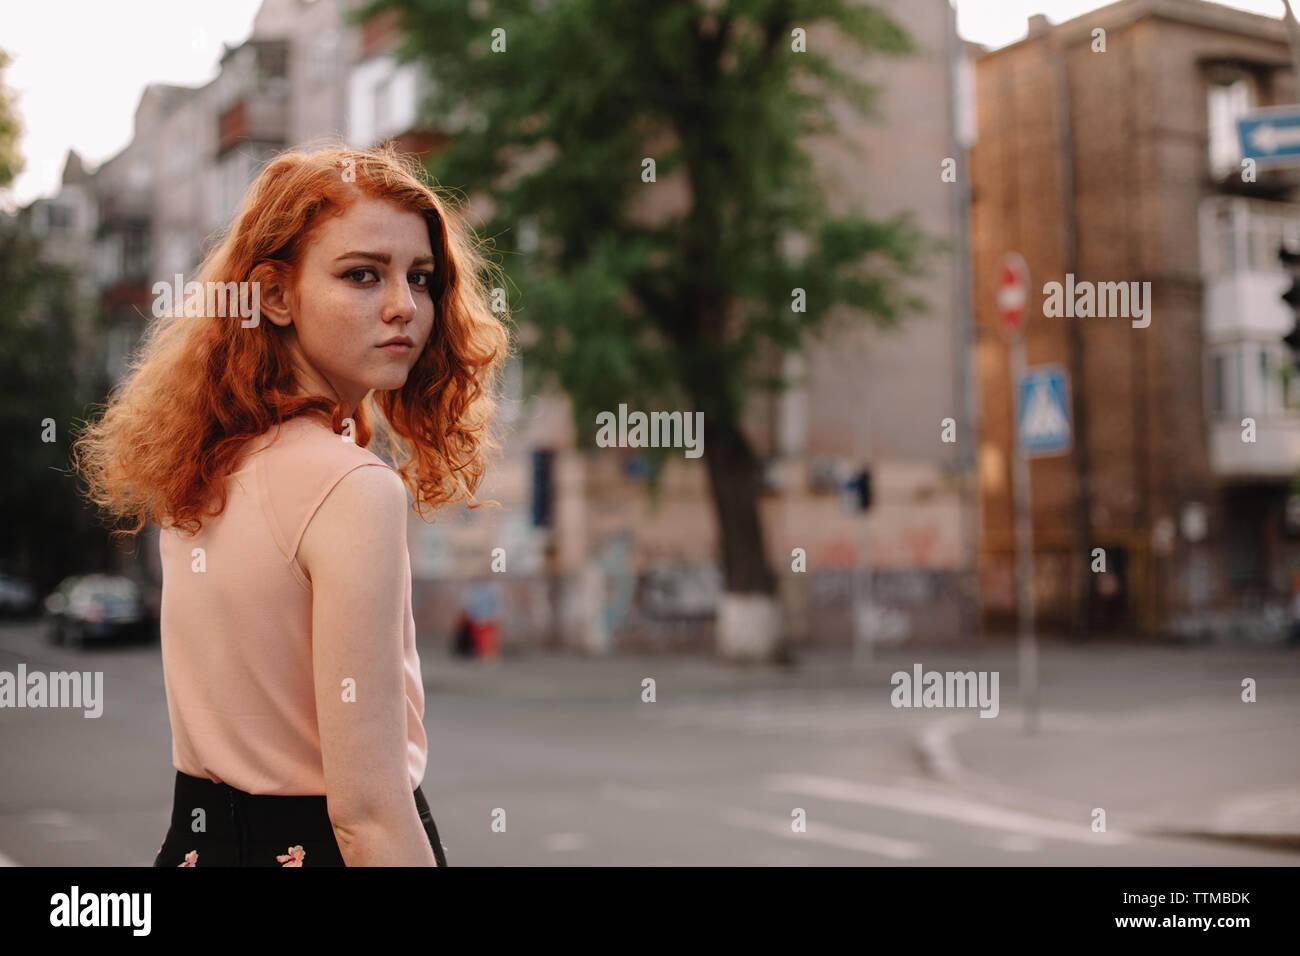 Junge rothaarige Frau, die zu Fuß in der Stadt. Stockfoto